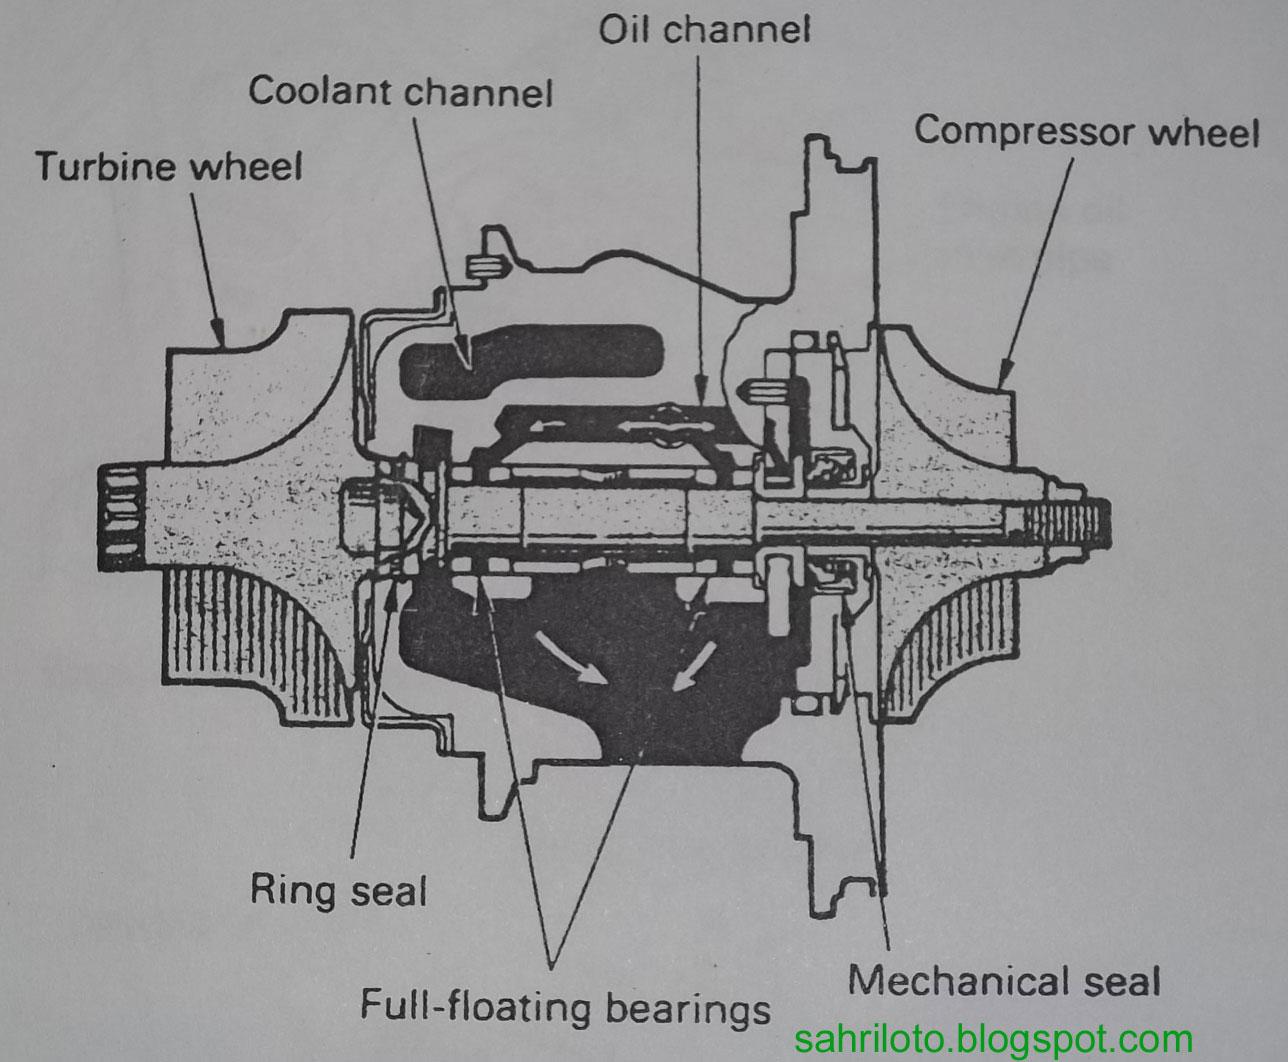 teknik mekanik otomotif: Januari 2012